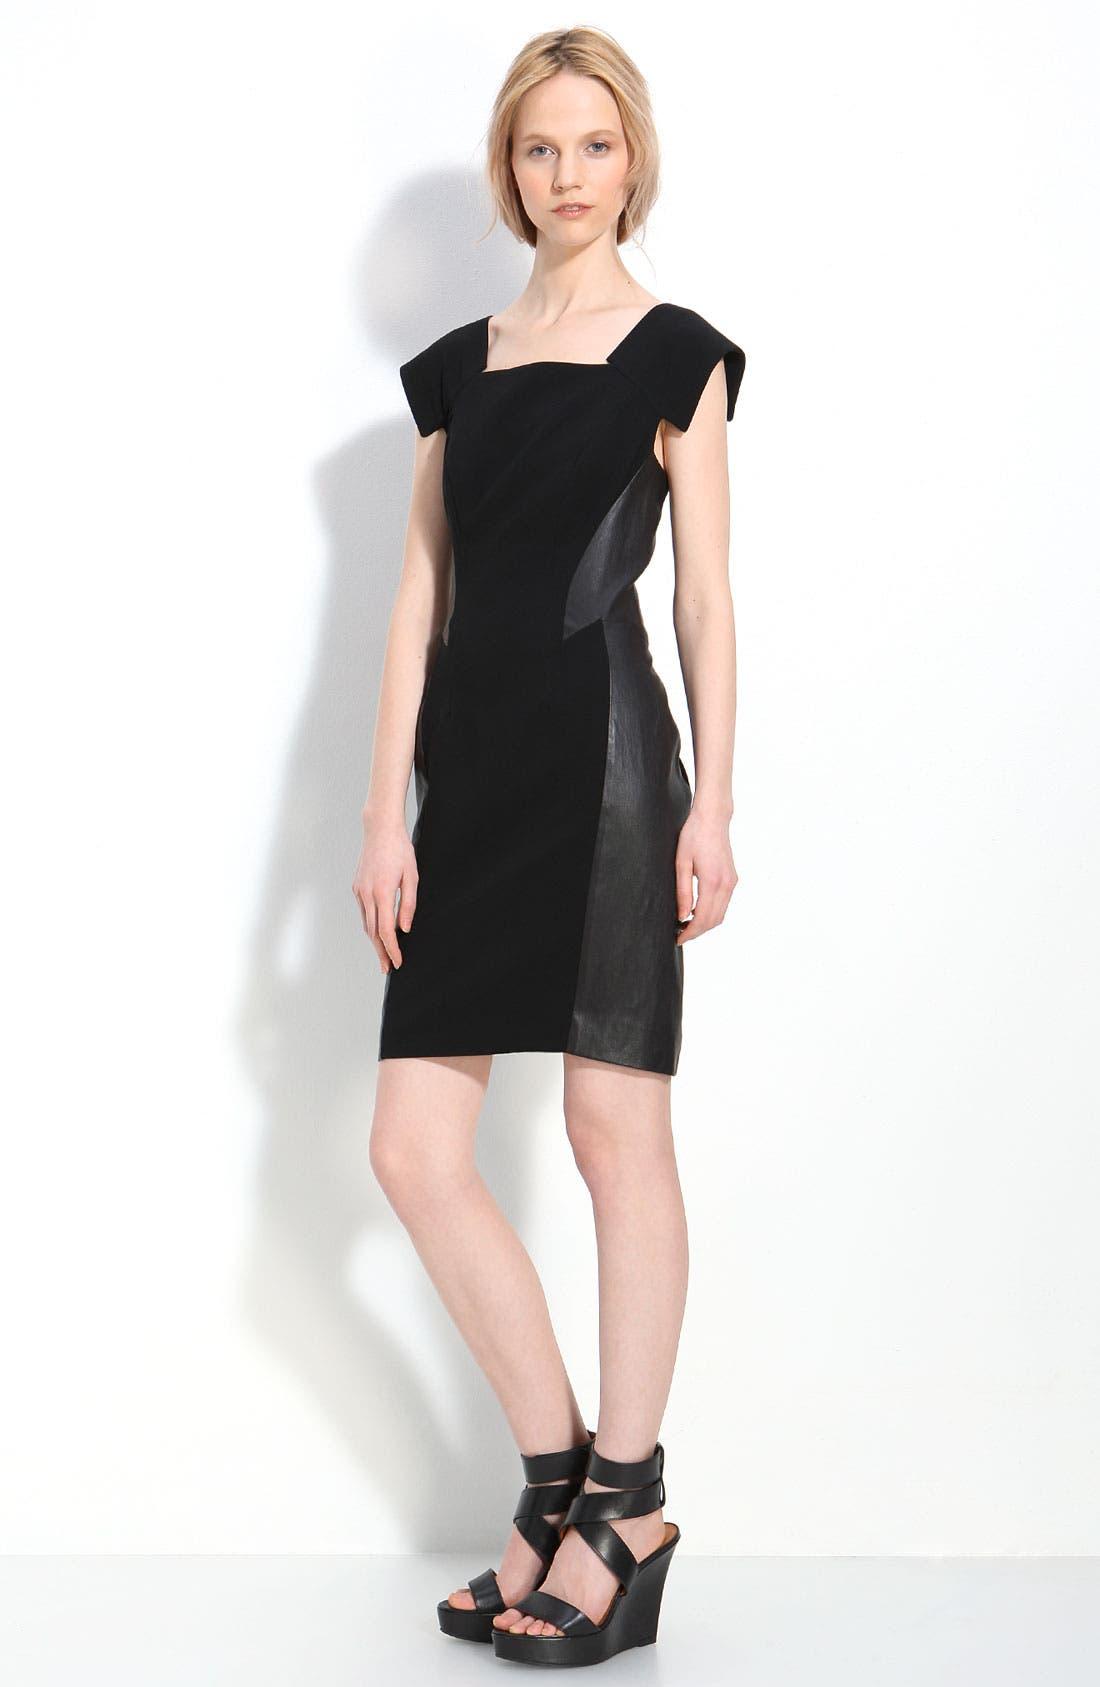 Alternate Image 1 Selected - rag & bone 'Surf' Leather Trim Dress